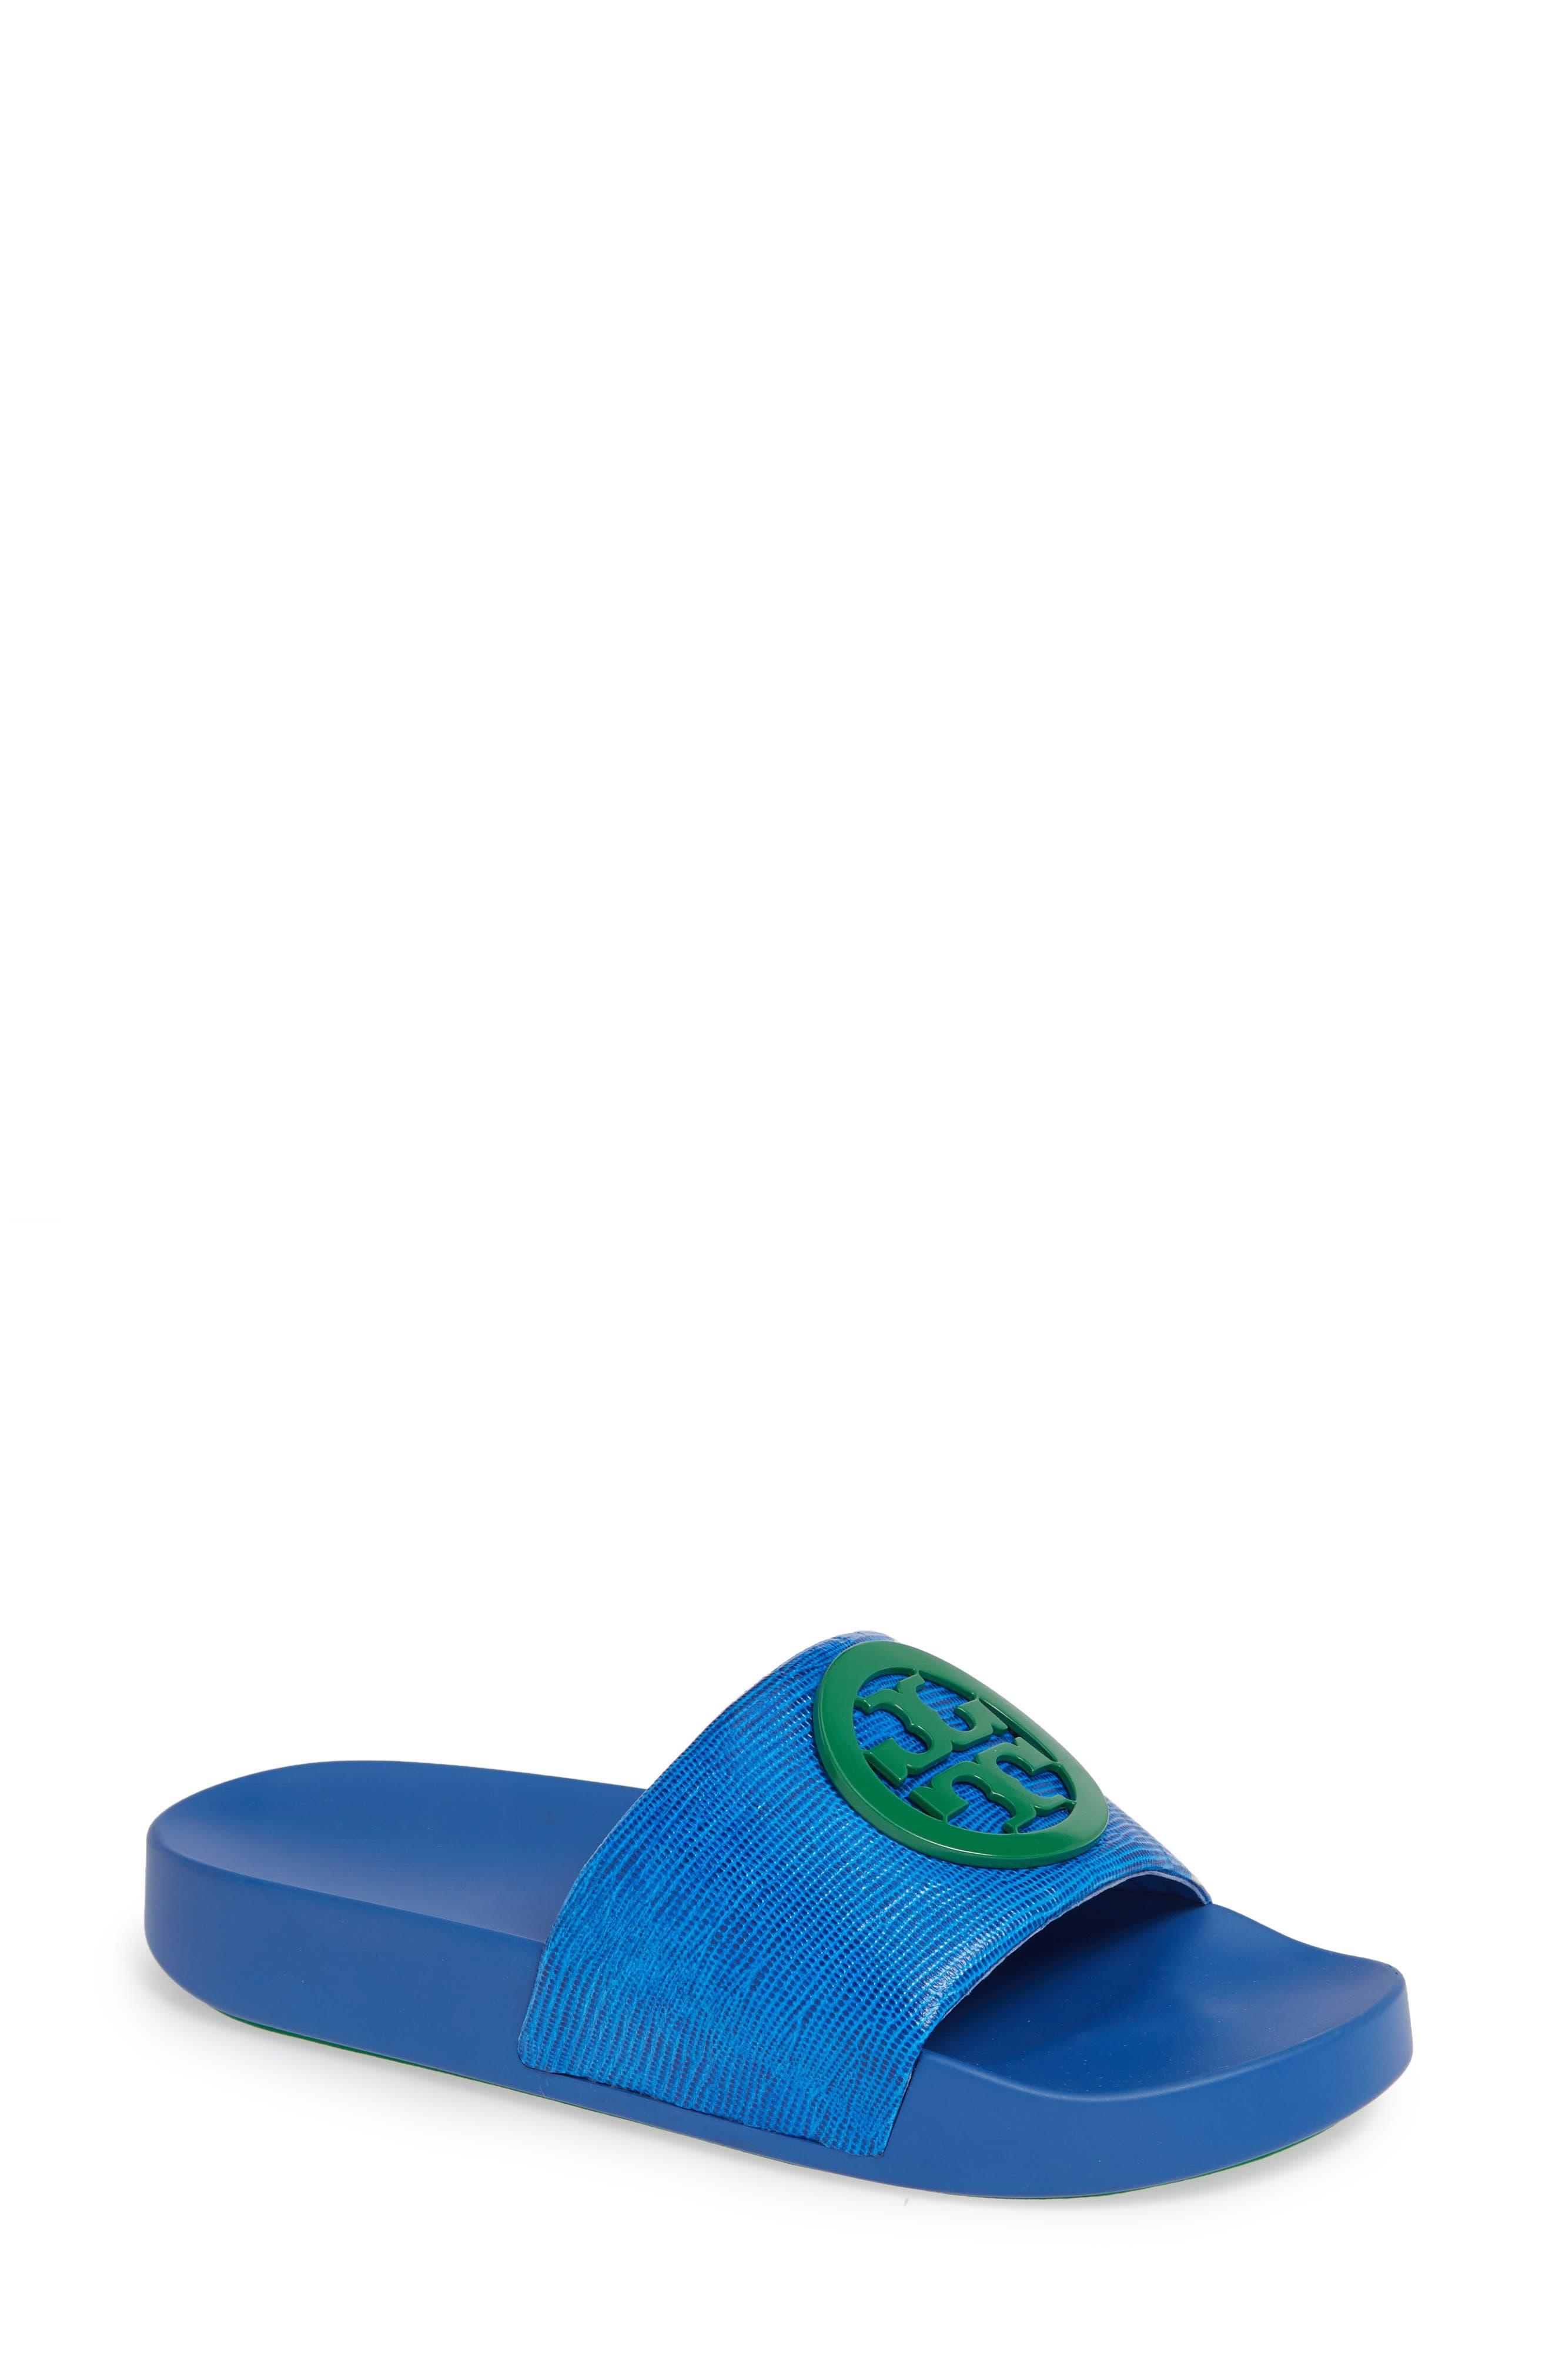 Tory Burch Lina Slide Sandal, Blue